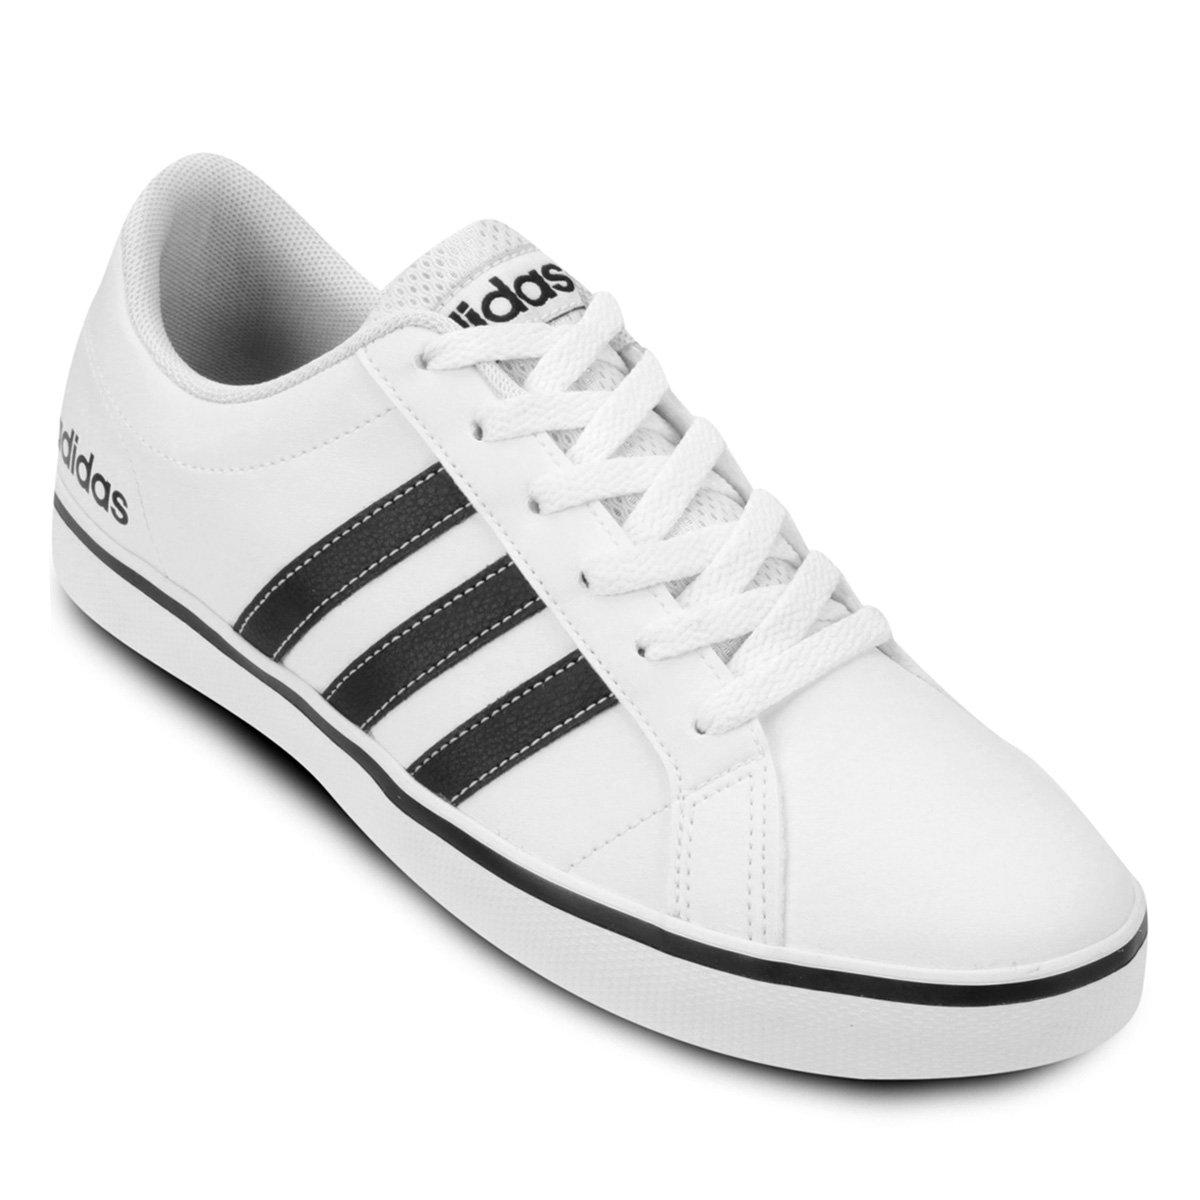 d439caf701 Tenis Adidas - Ótimos Preços | Zattini